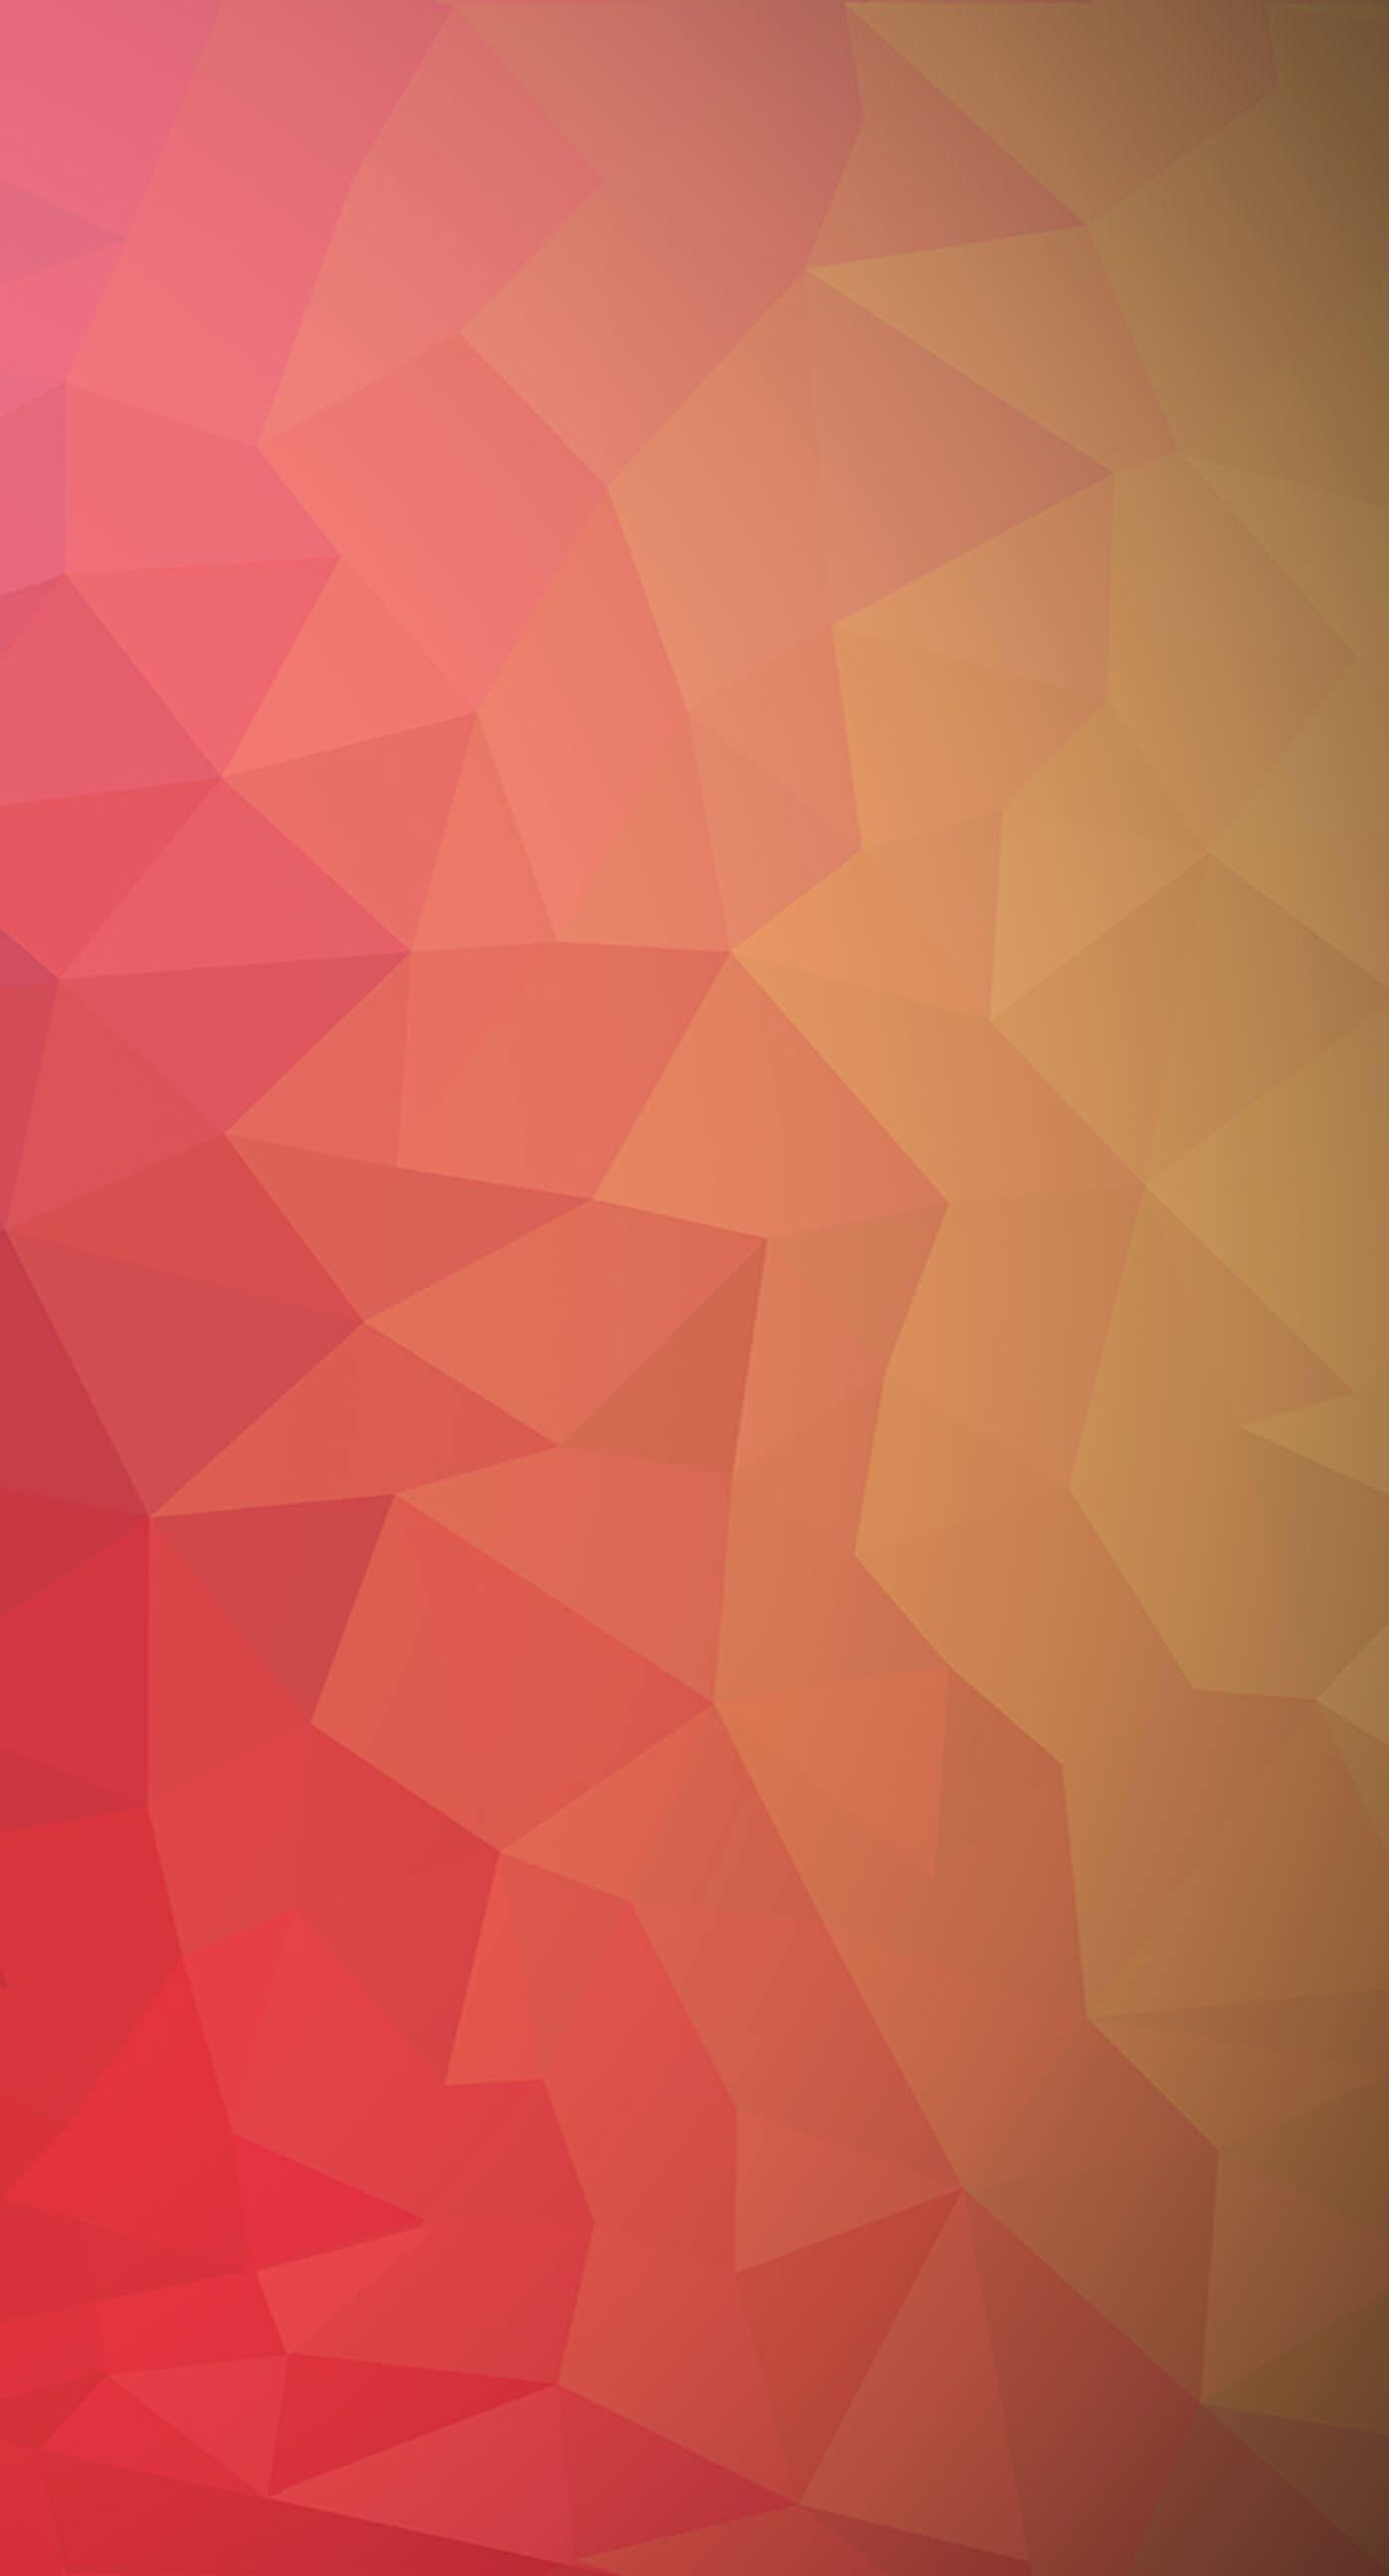 Pattern red peach orange cool iPhone7 Plus Wallpaper